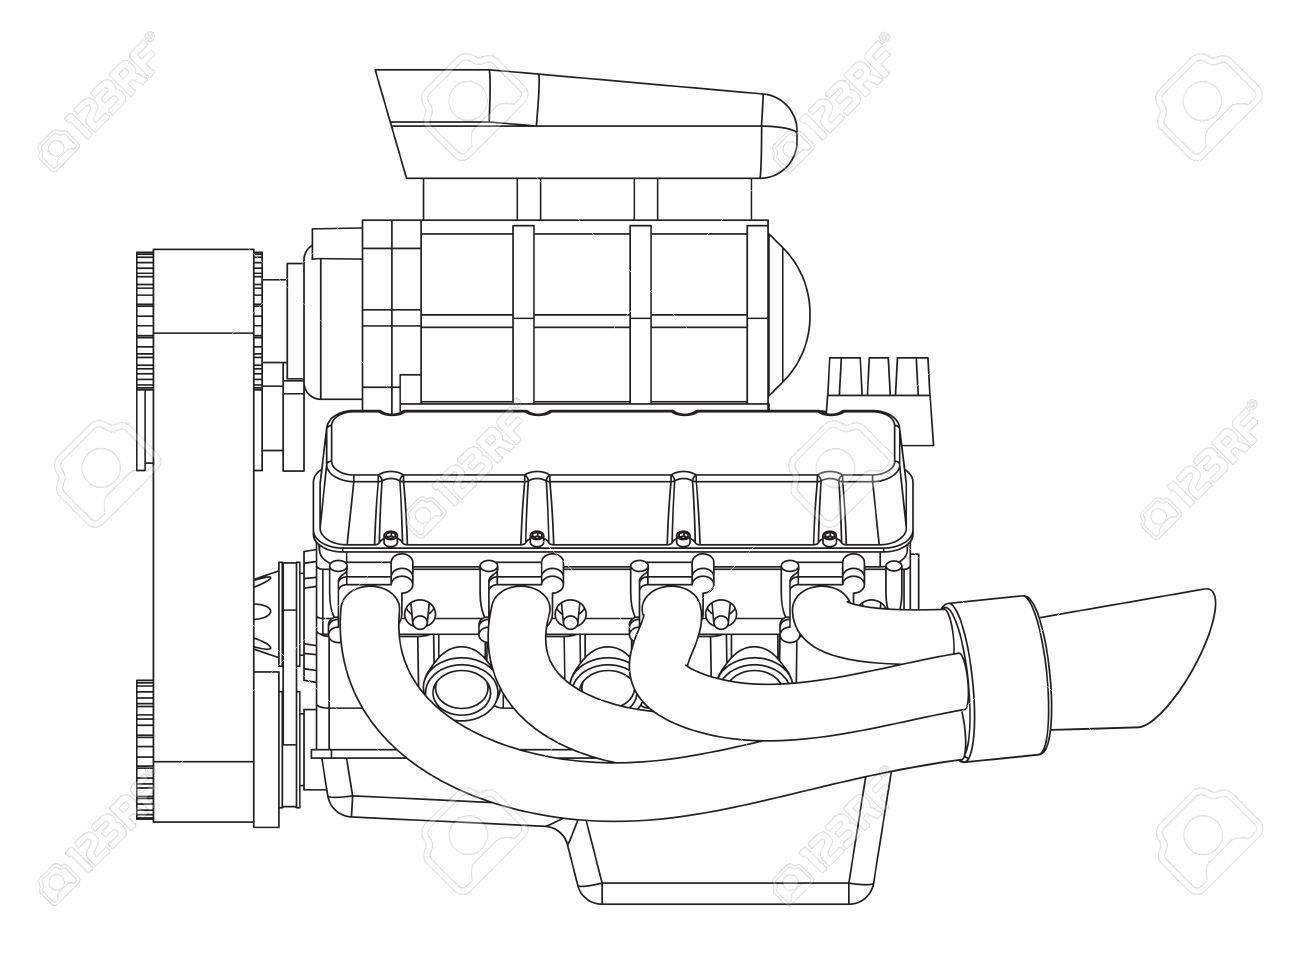 Banque d'images - Schéma de Hot Rod Engine. Vector illustration